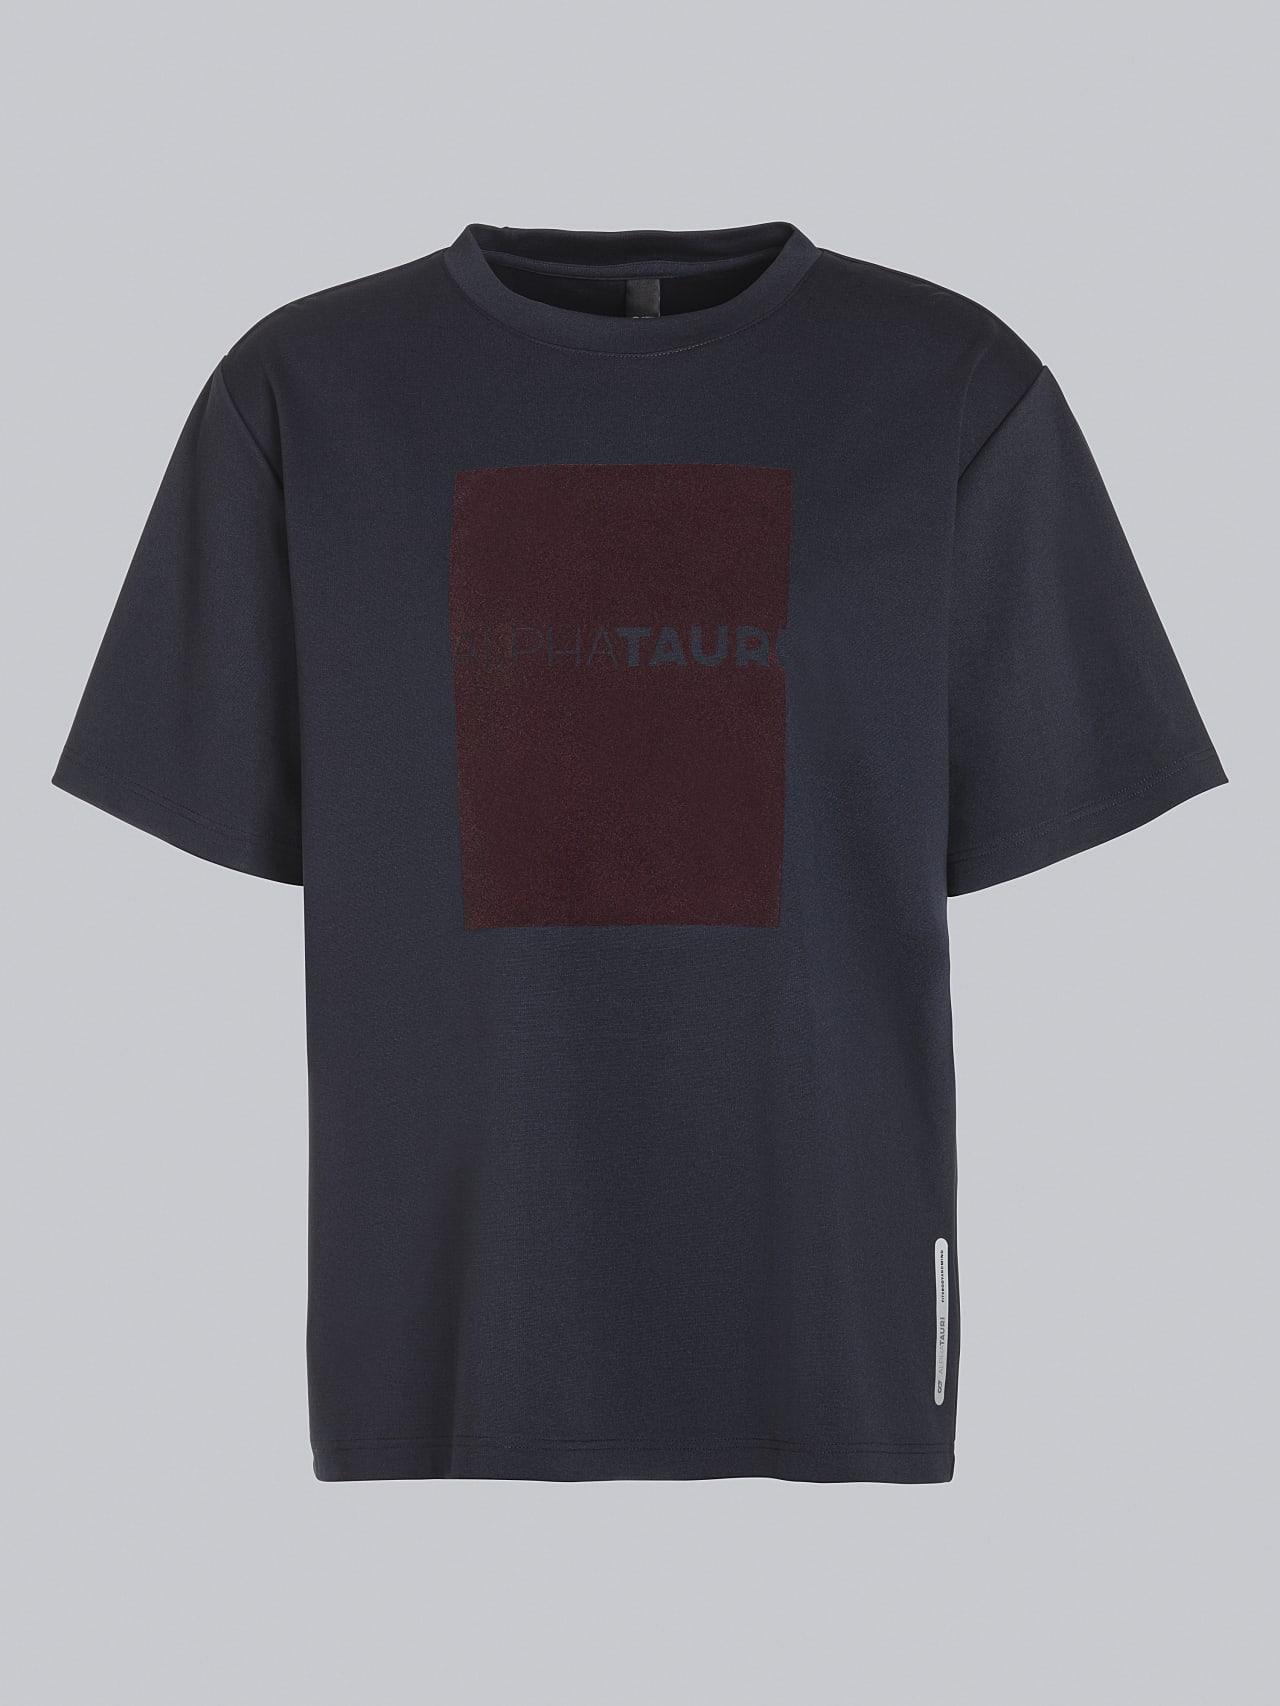 JAHEV V1.Y5.02 Relaxed Logo T-Shirt navy Back Alpha Tauri